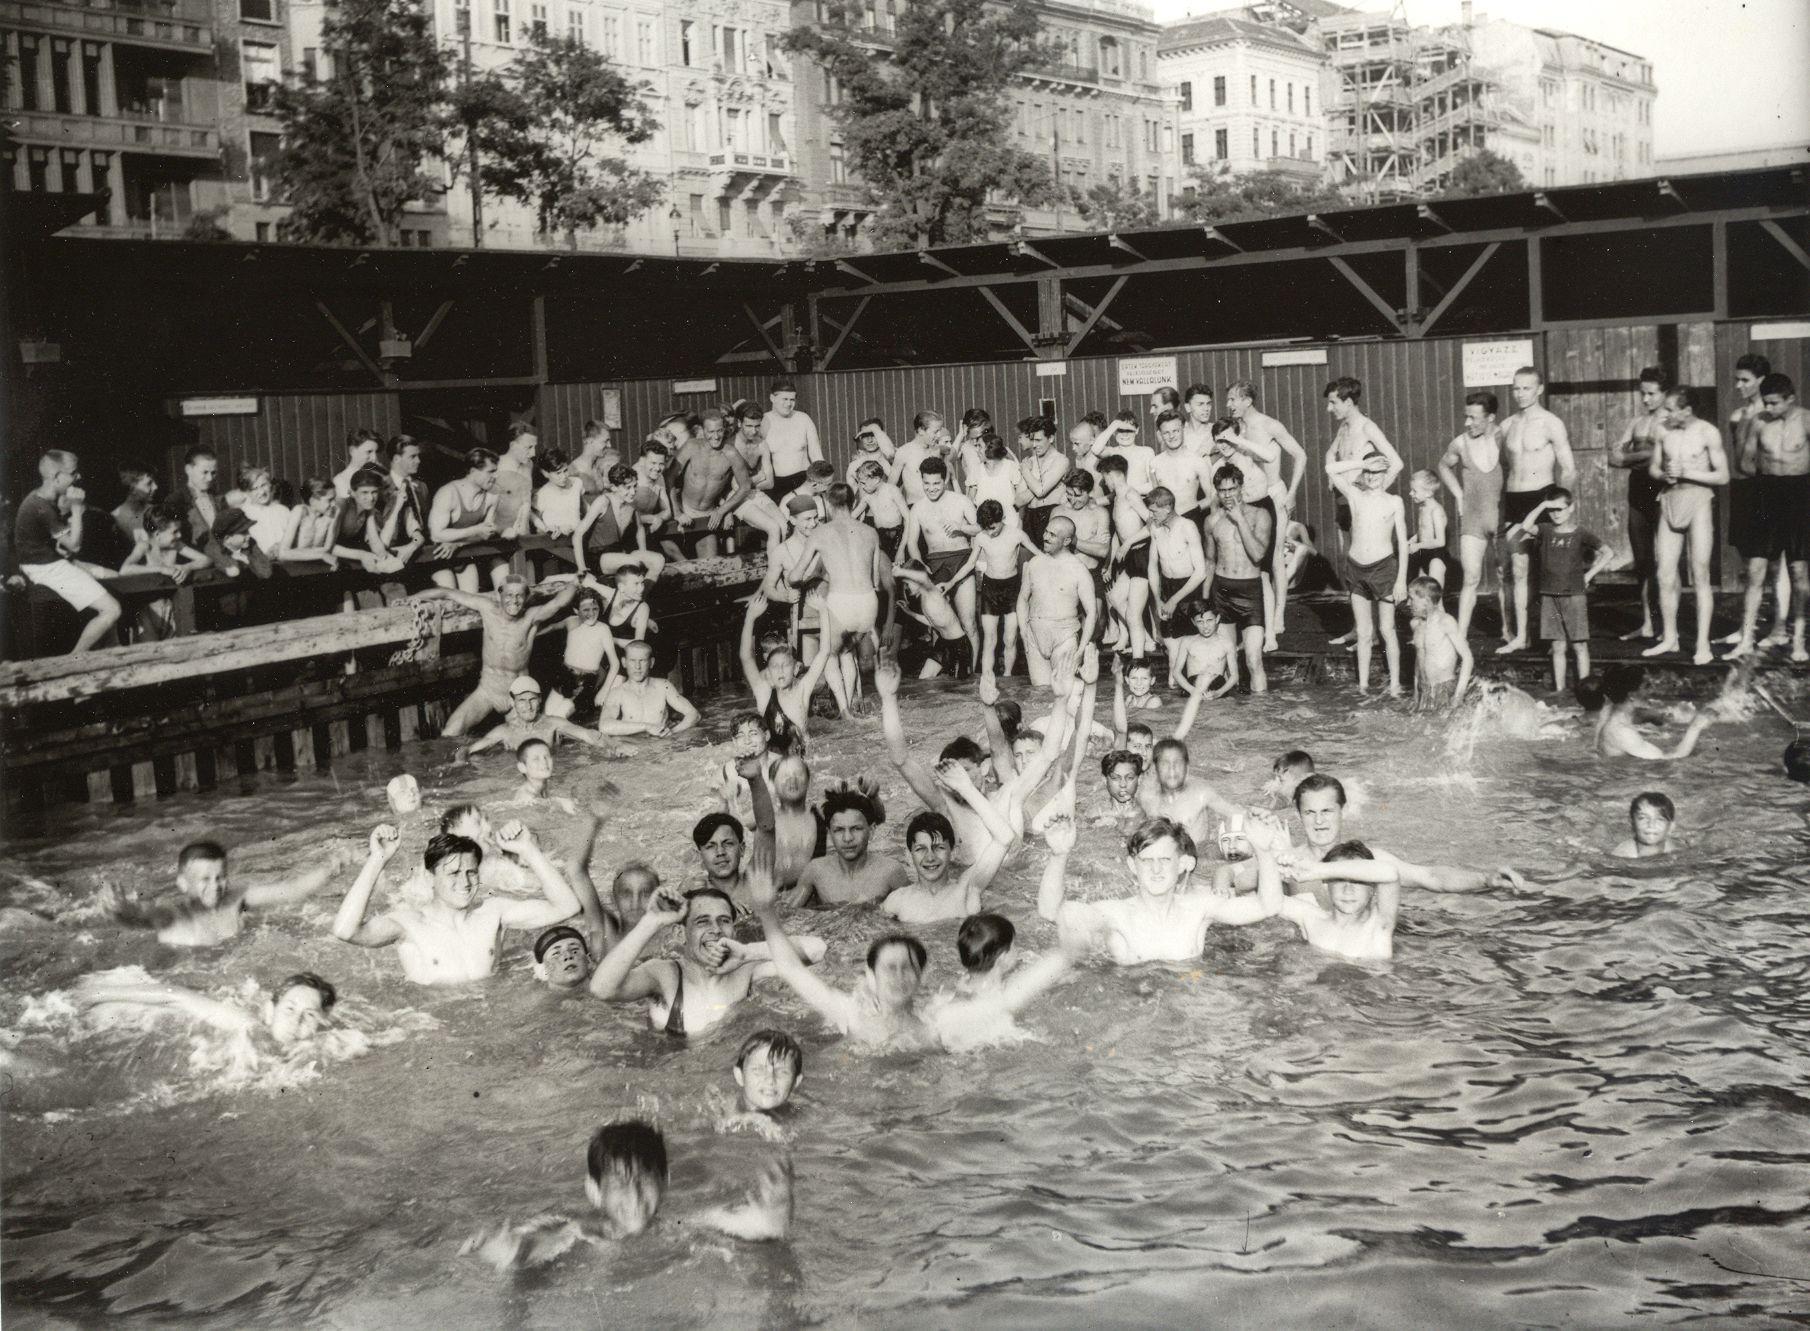 dunafurdo1930.jpg